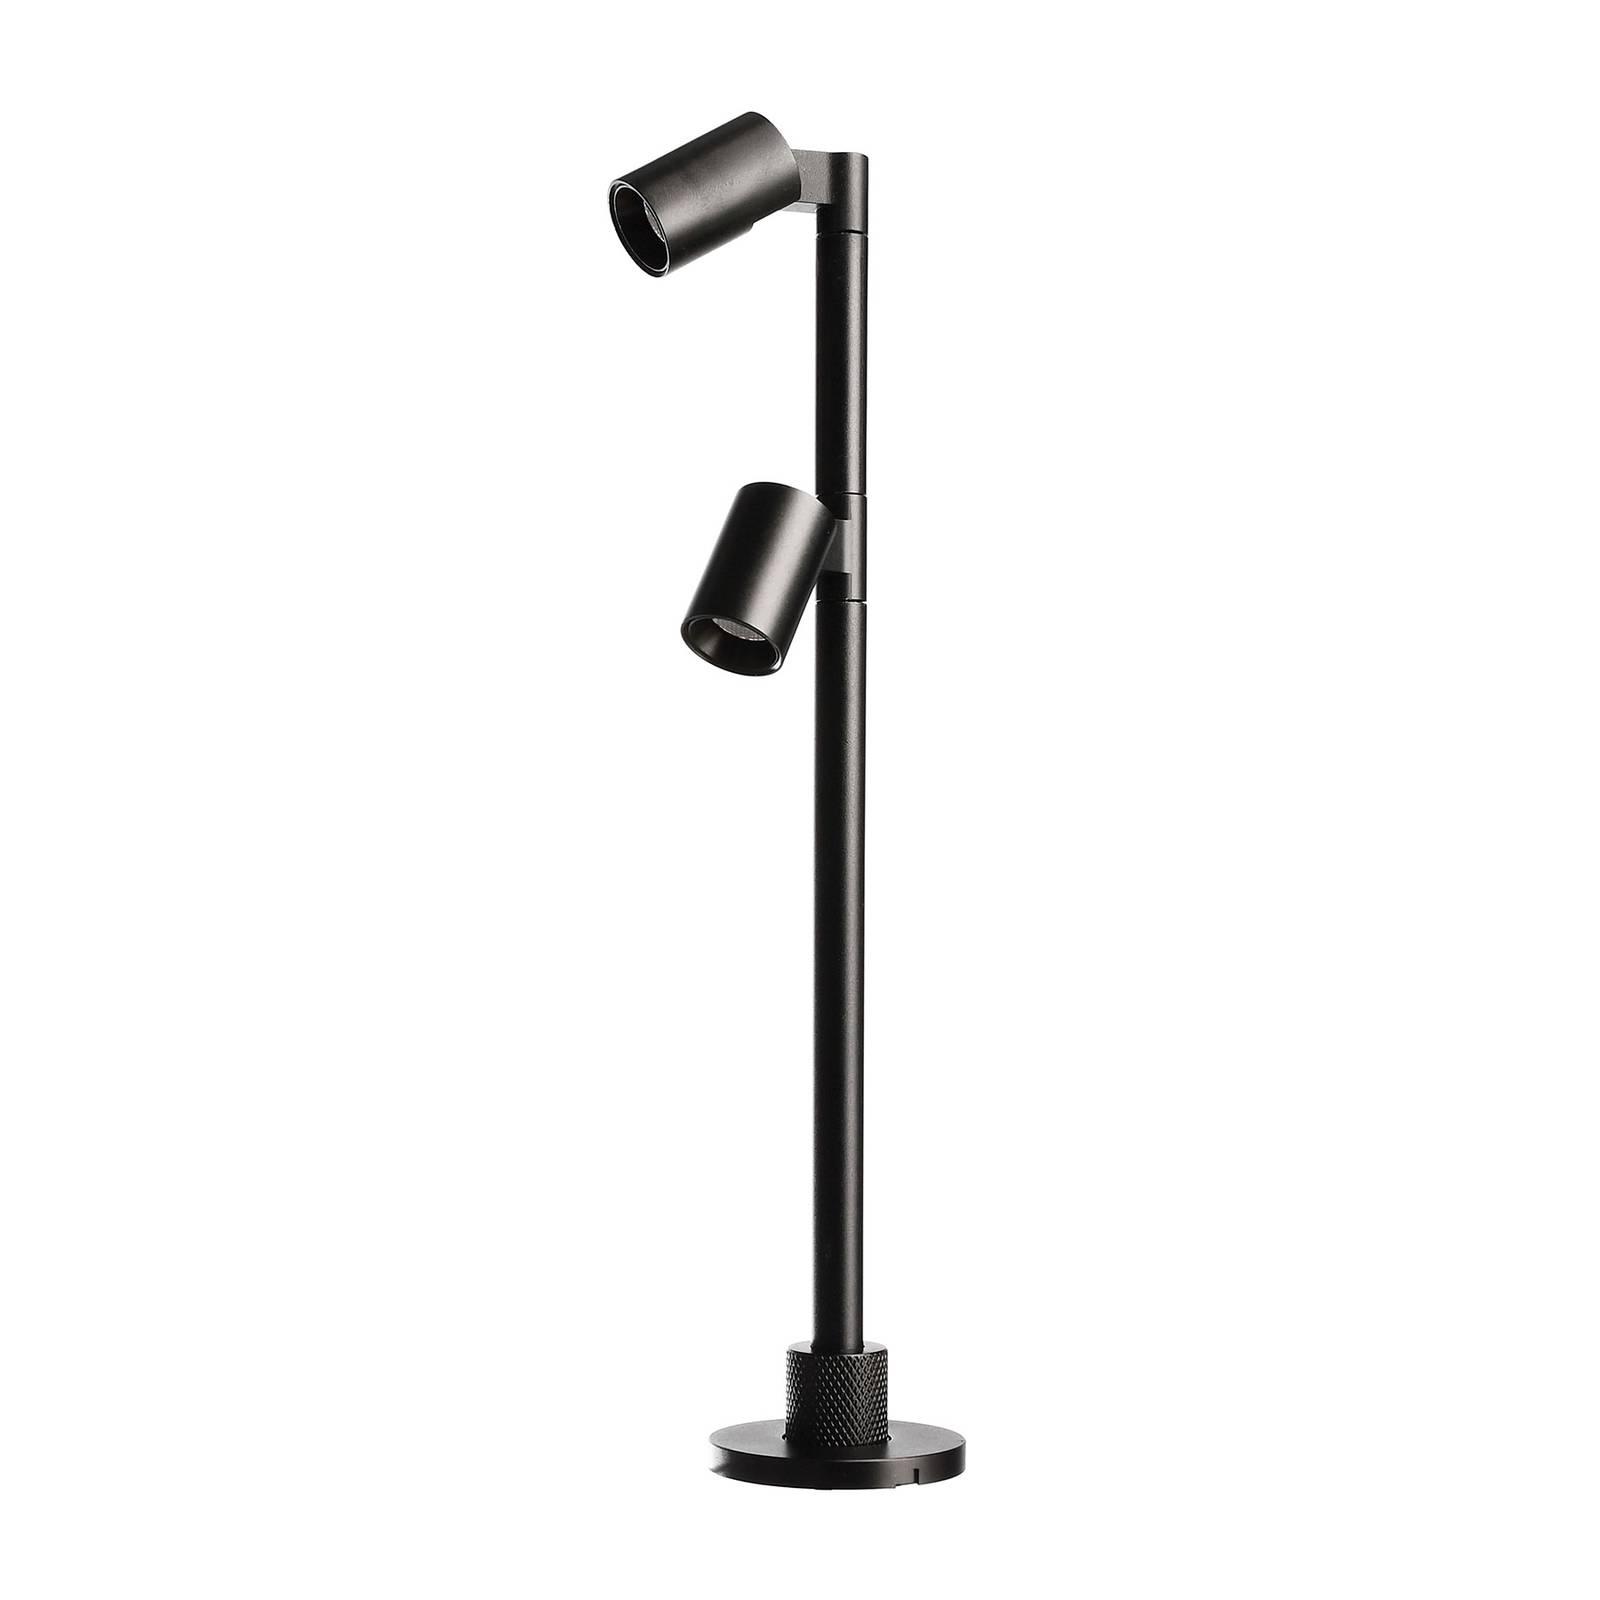 LED-display-valaisin Herculis double 3 000 K musta